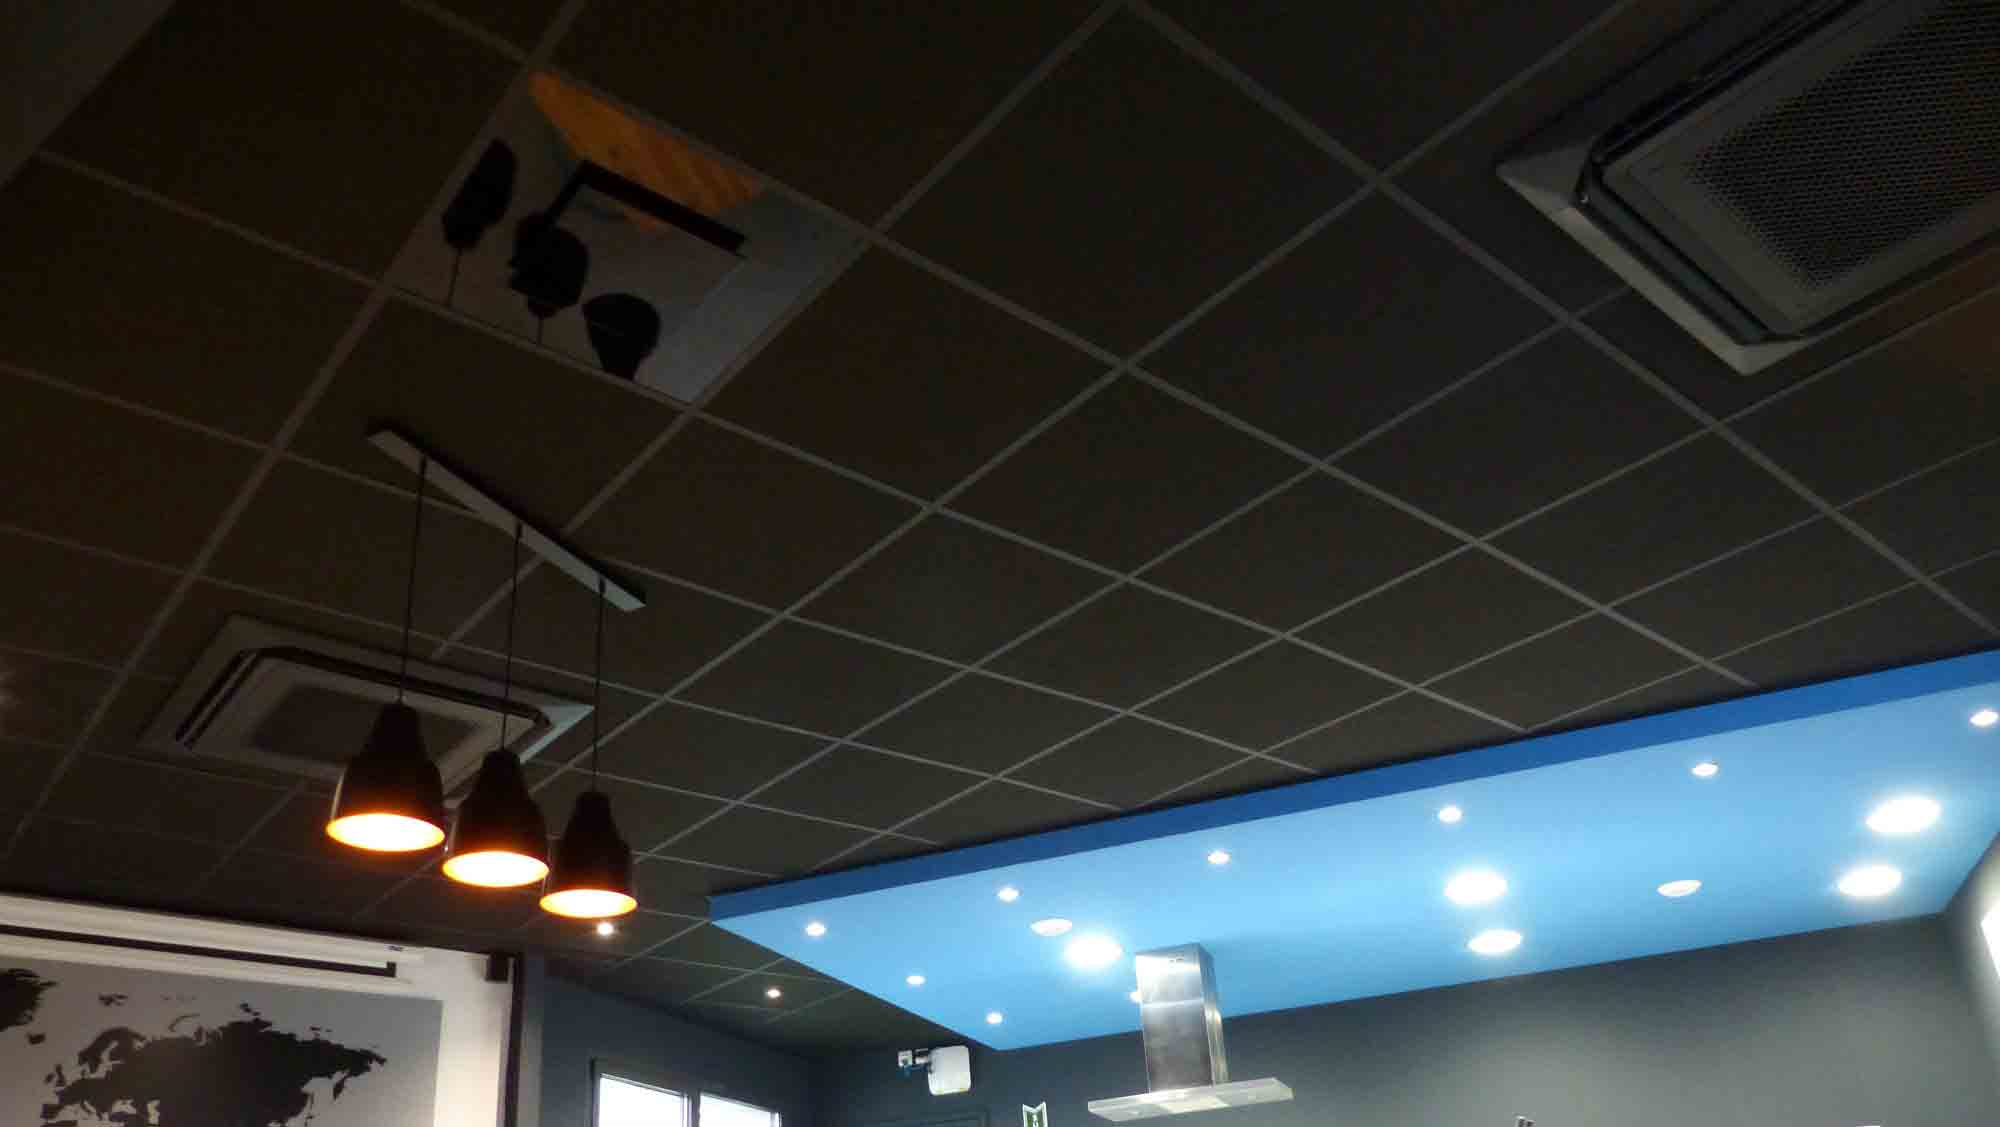 Langlois Sobreti Rennes Plafond Suspendu Palamatic 35 Brece